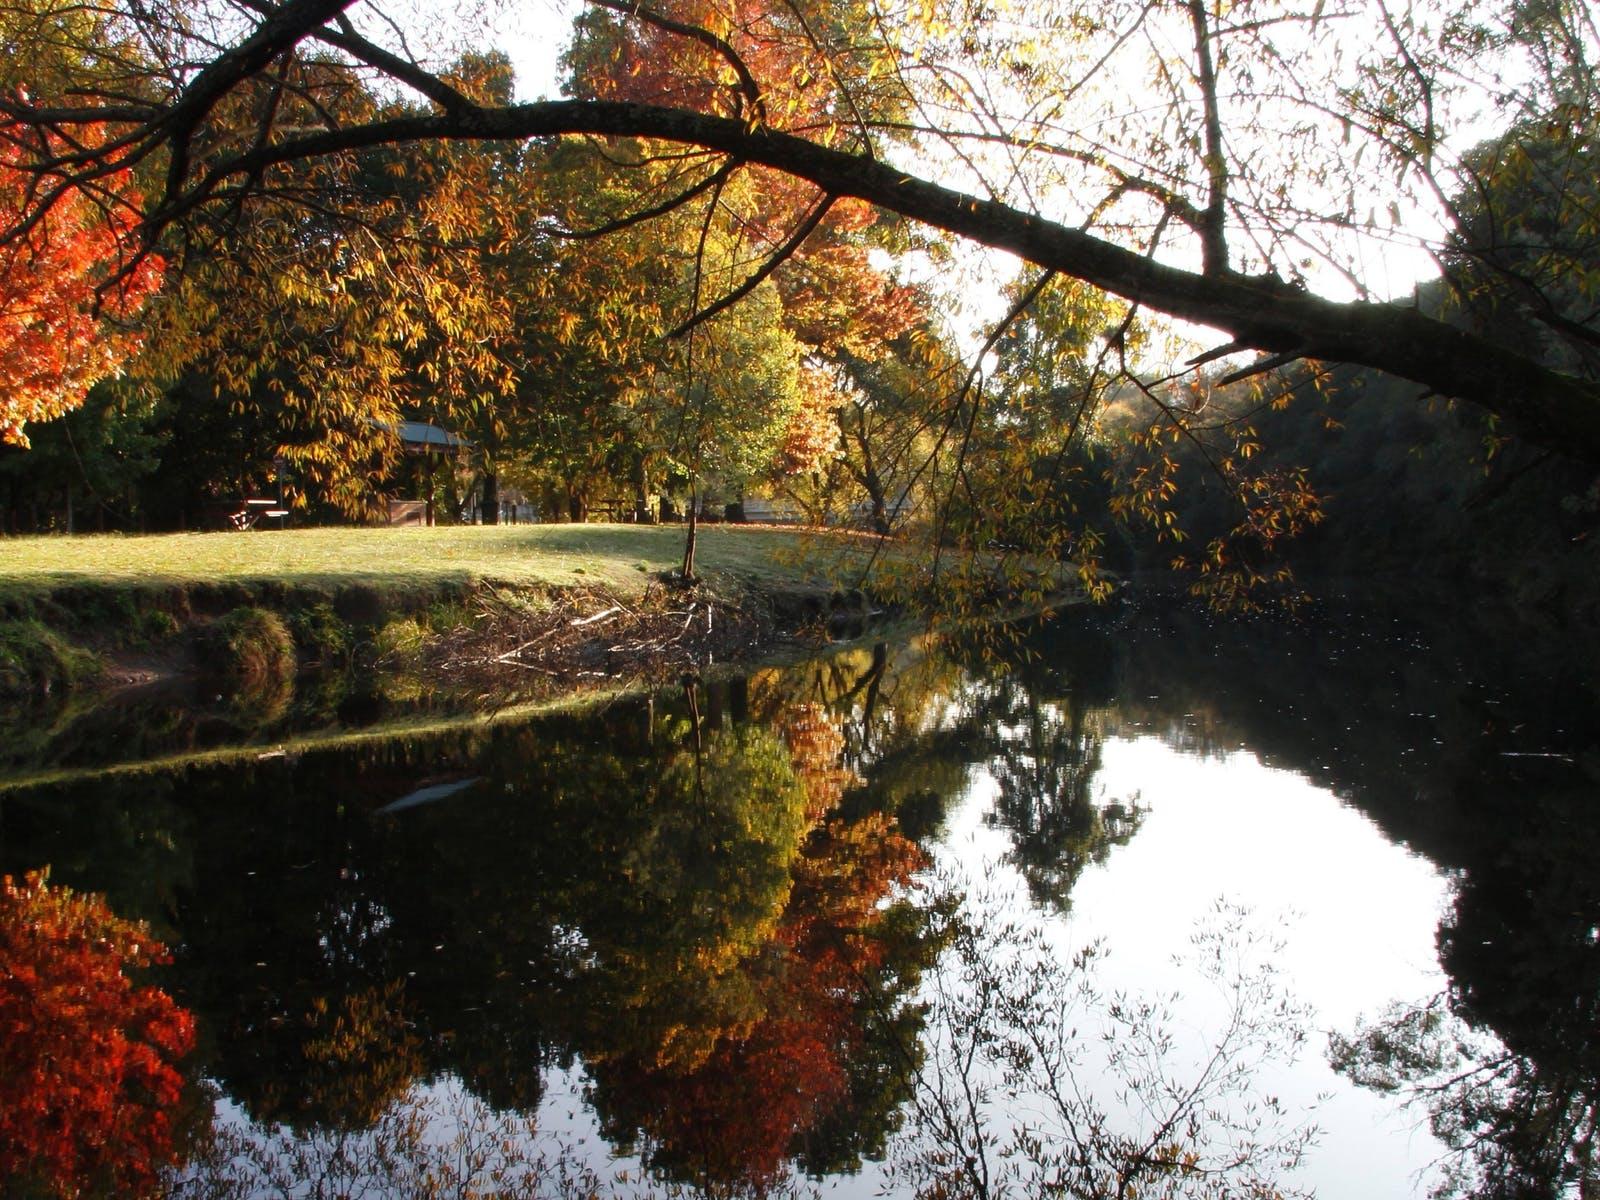 Trees along the riverbank